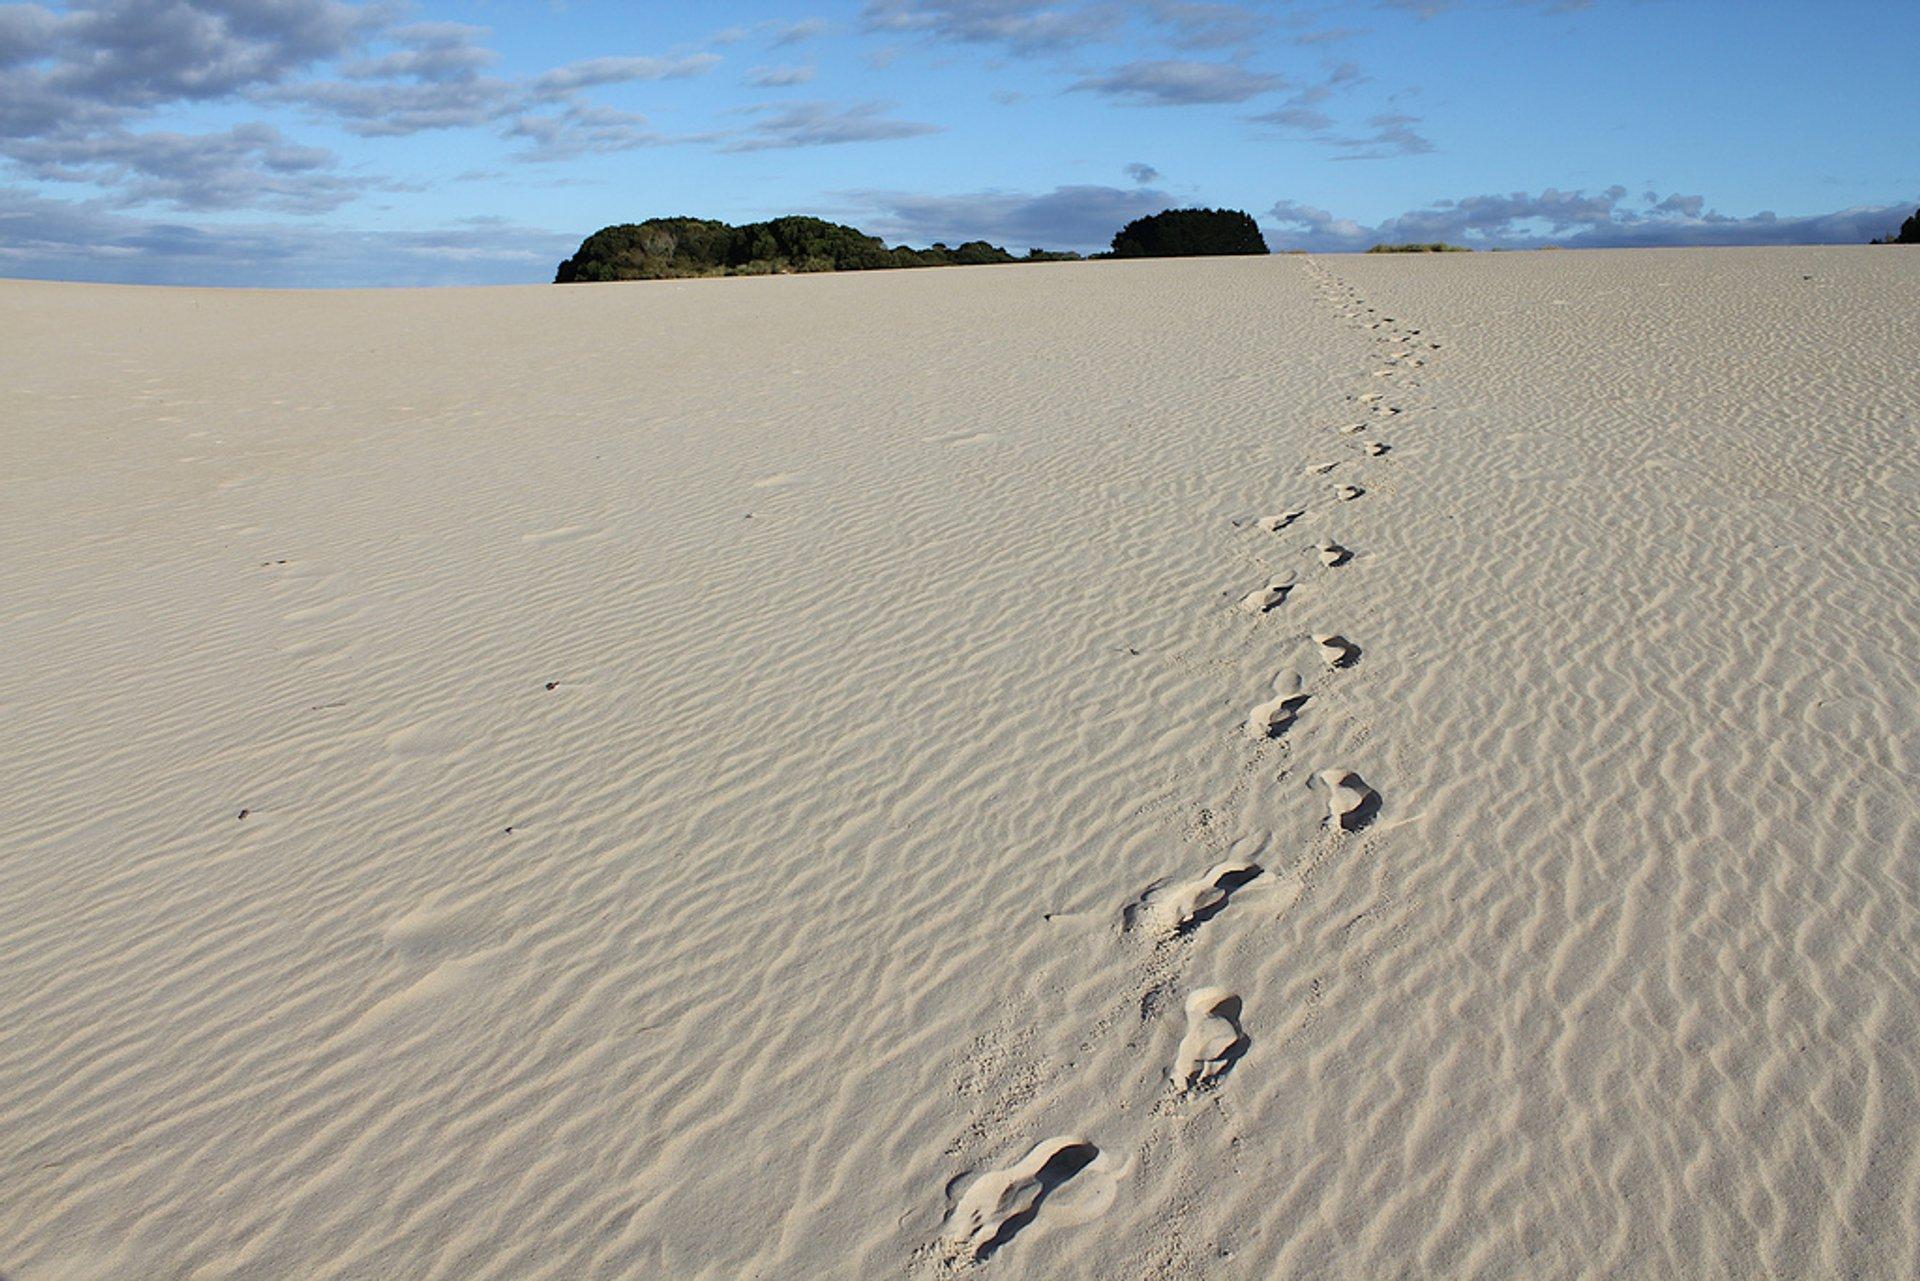 Sandboarding Season in Tasmania 2019 - Best Time